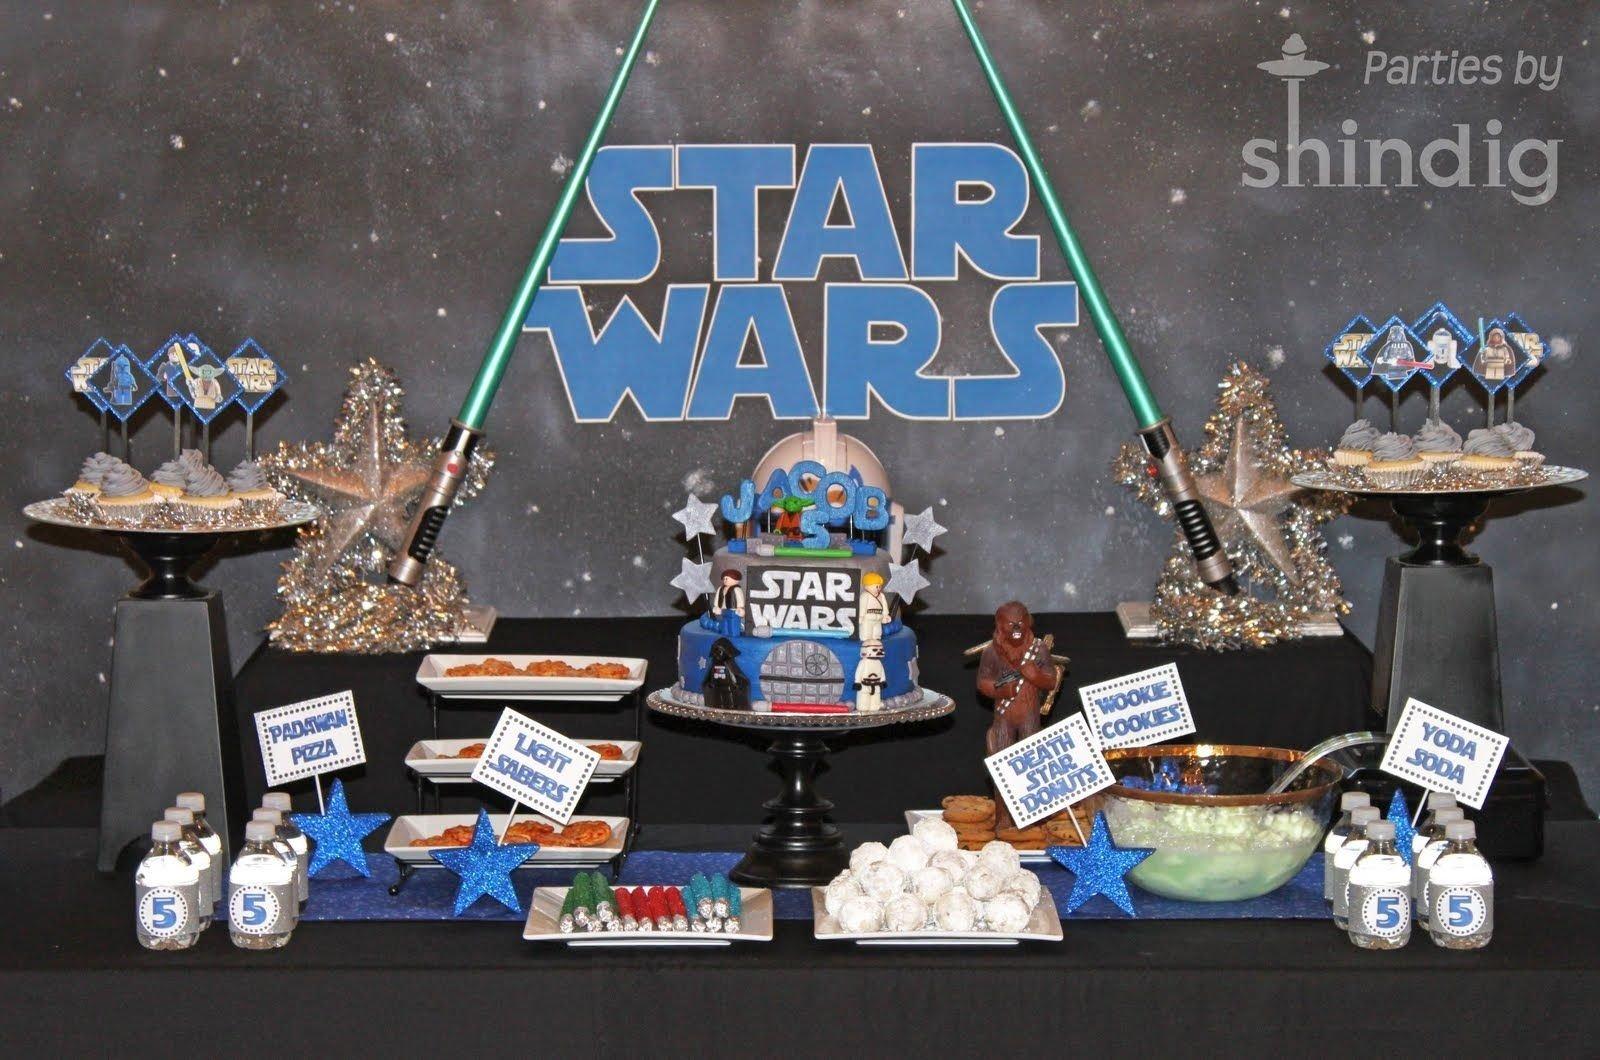 10 Lovely Star Wars Birthday Party Ideas winning star wars birthday party 2020